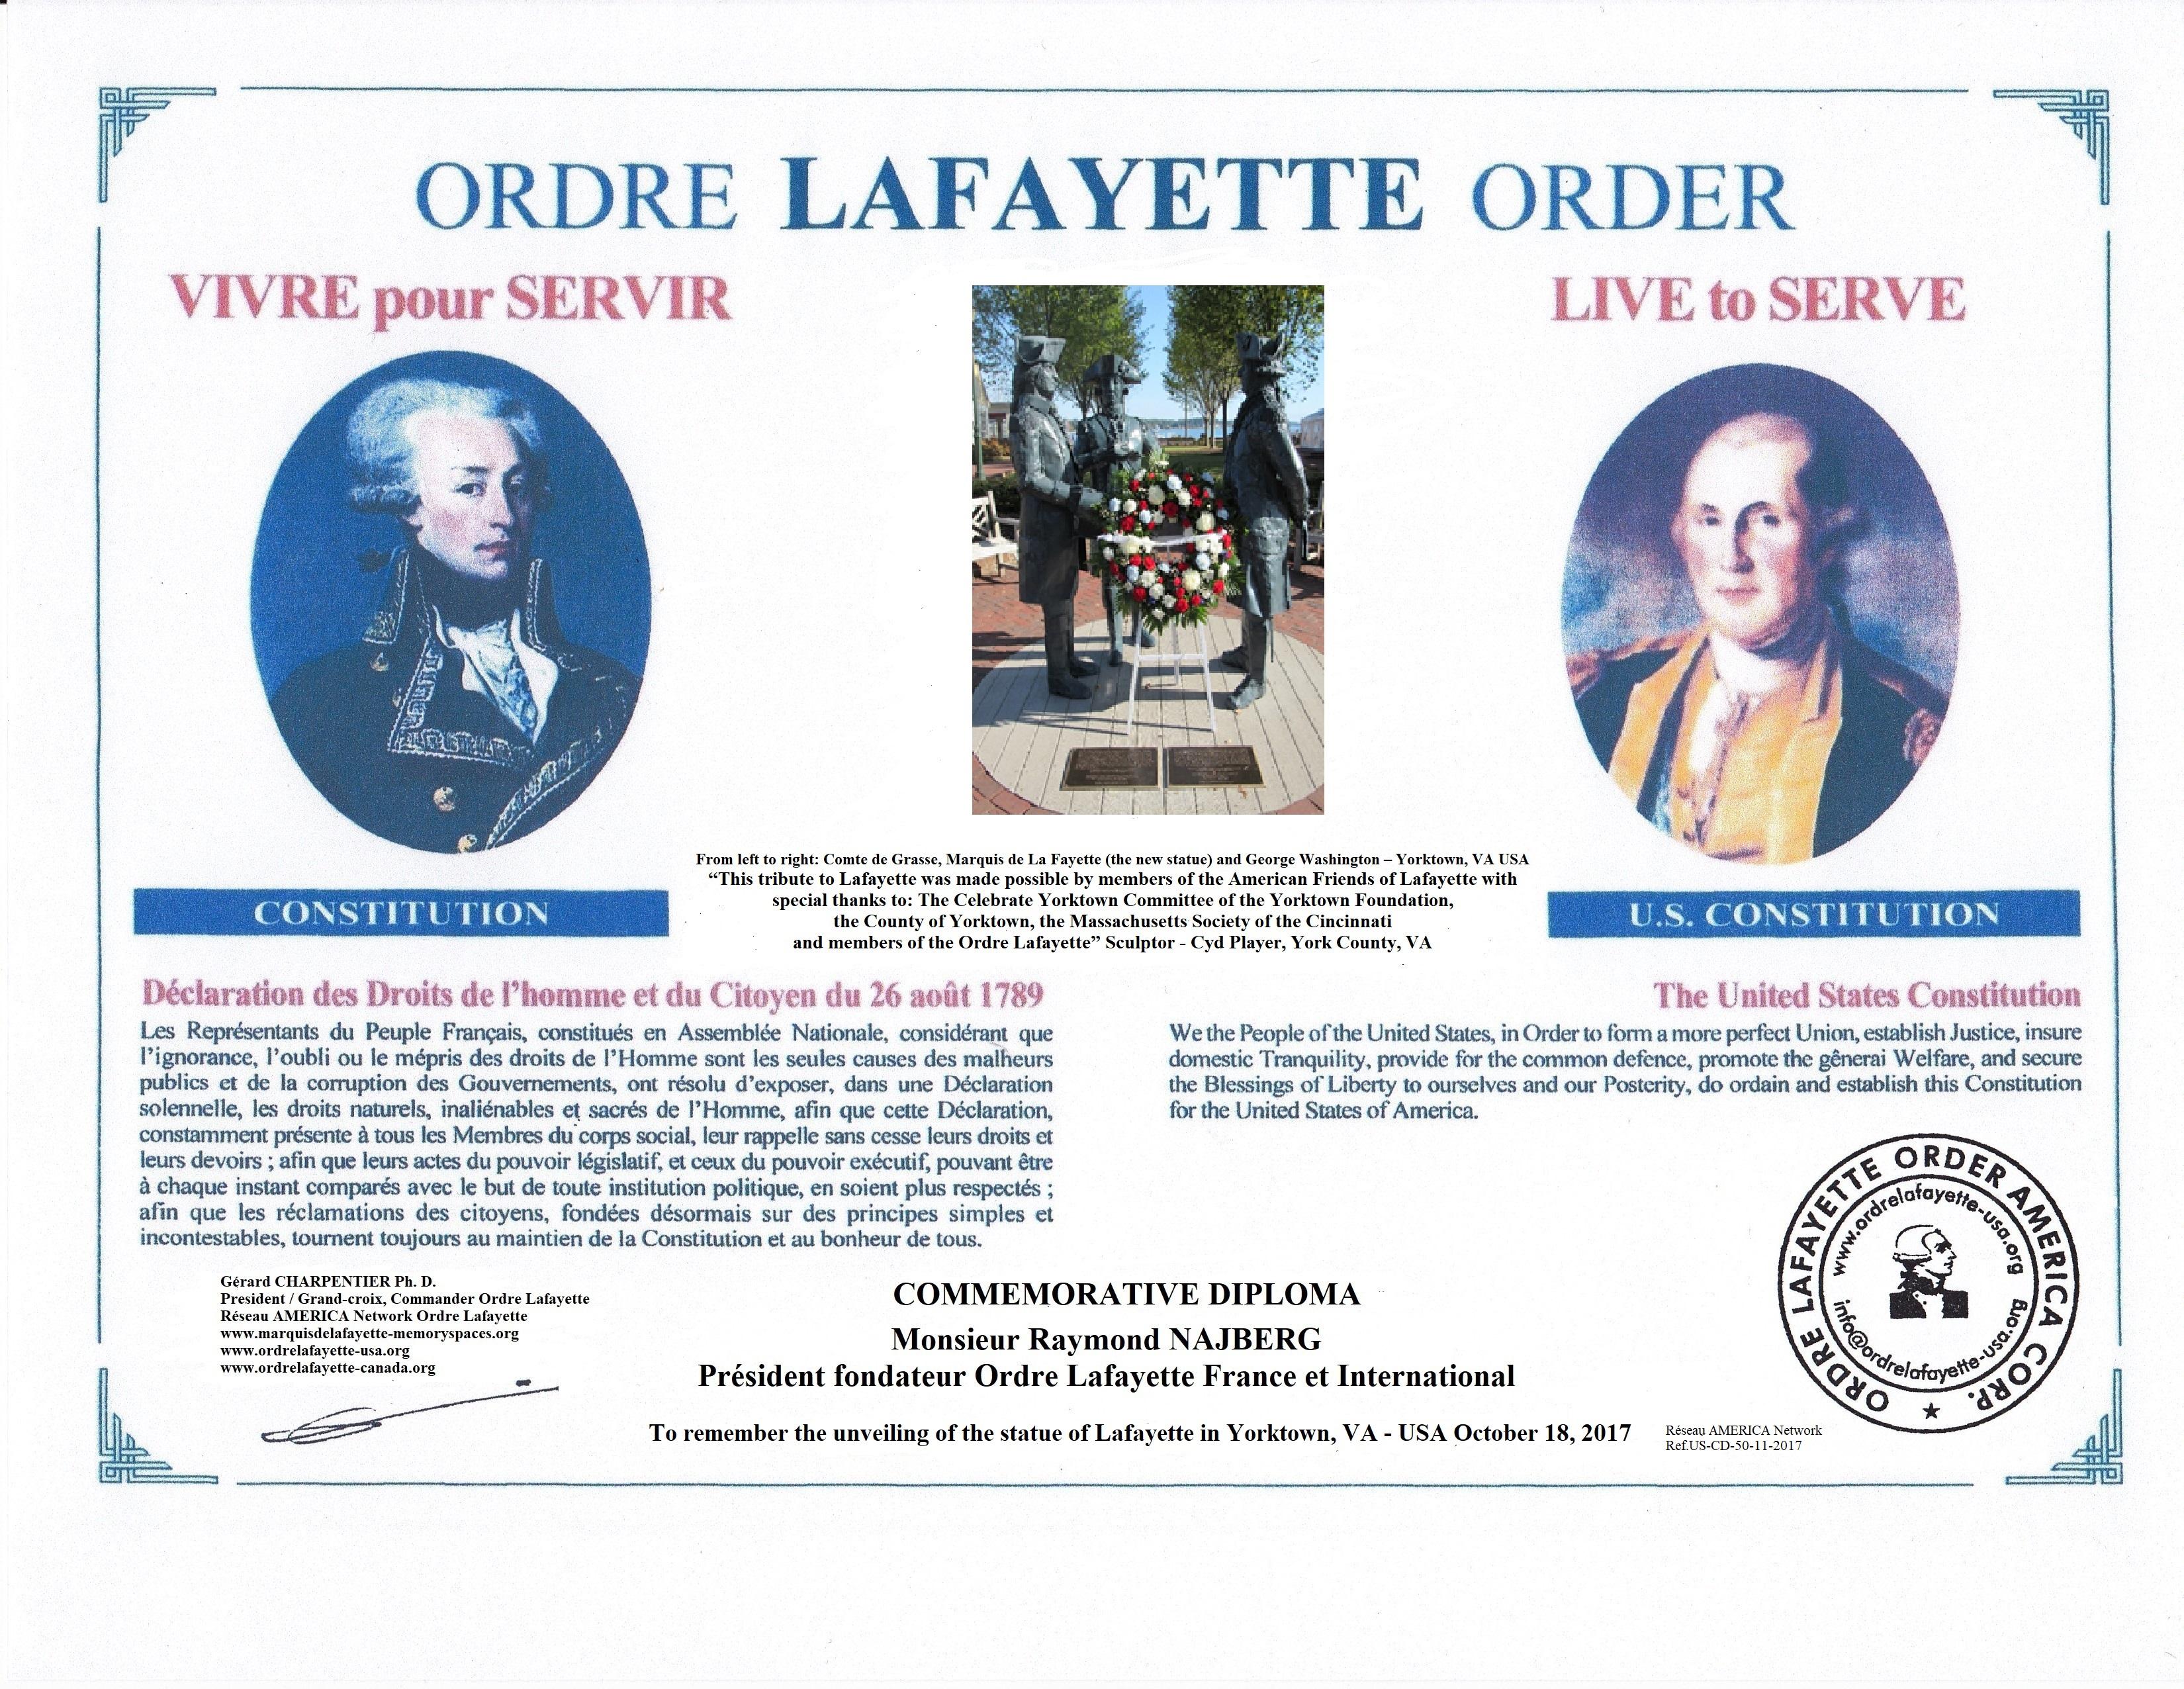 OL.USA- RN- Commemo. Diploma  Lafayette Statue Yorktown, VA November 18, 2017